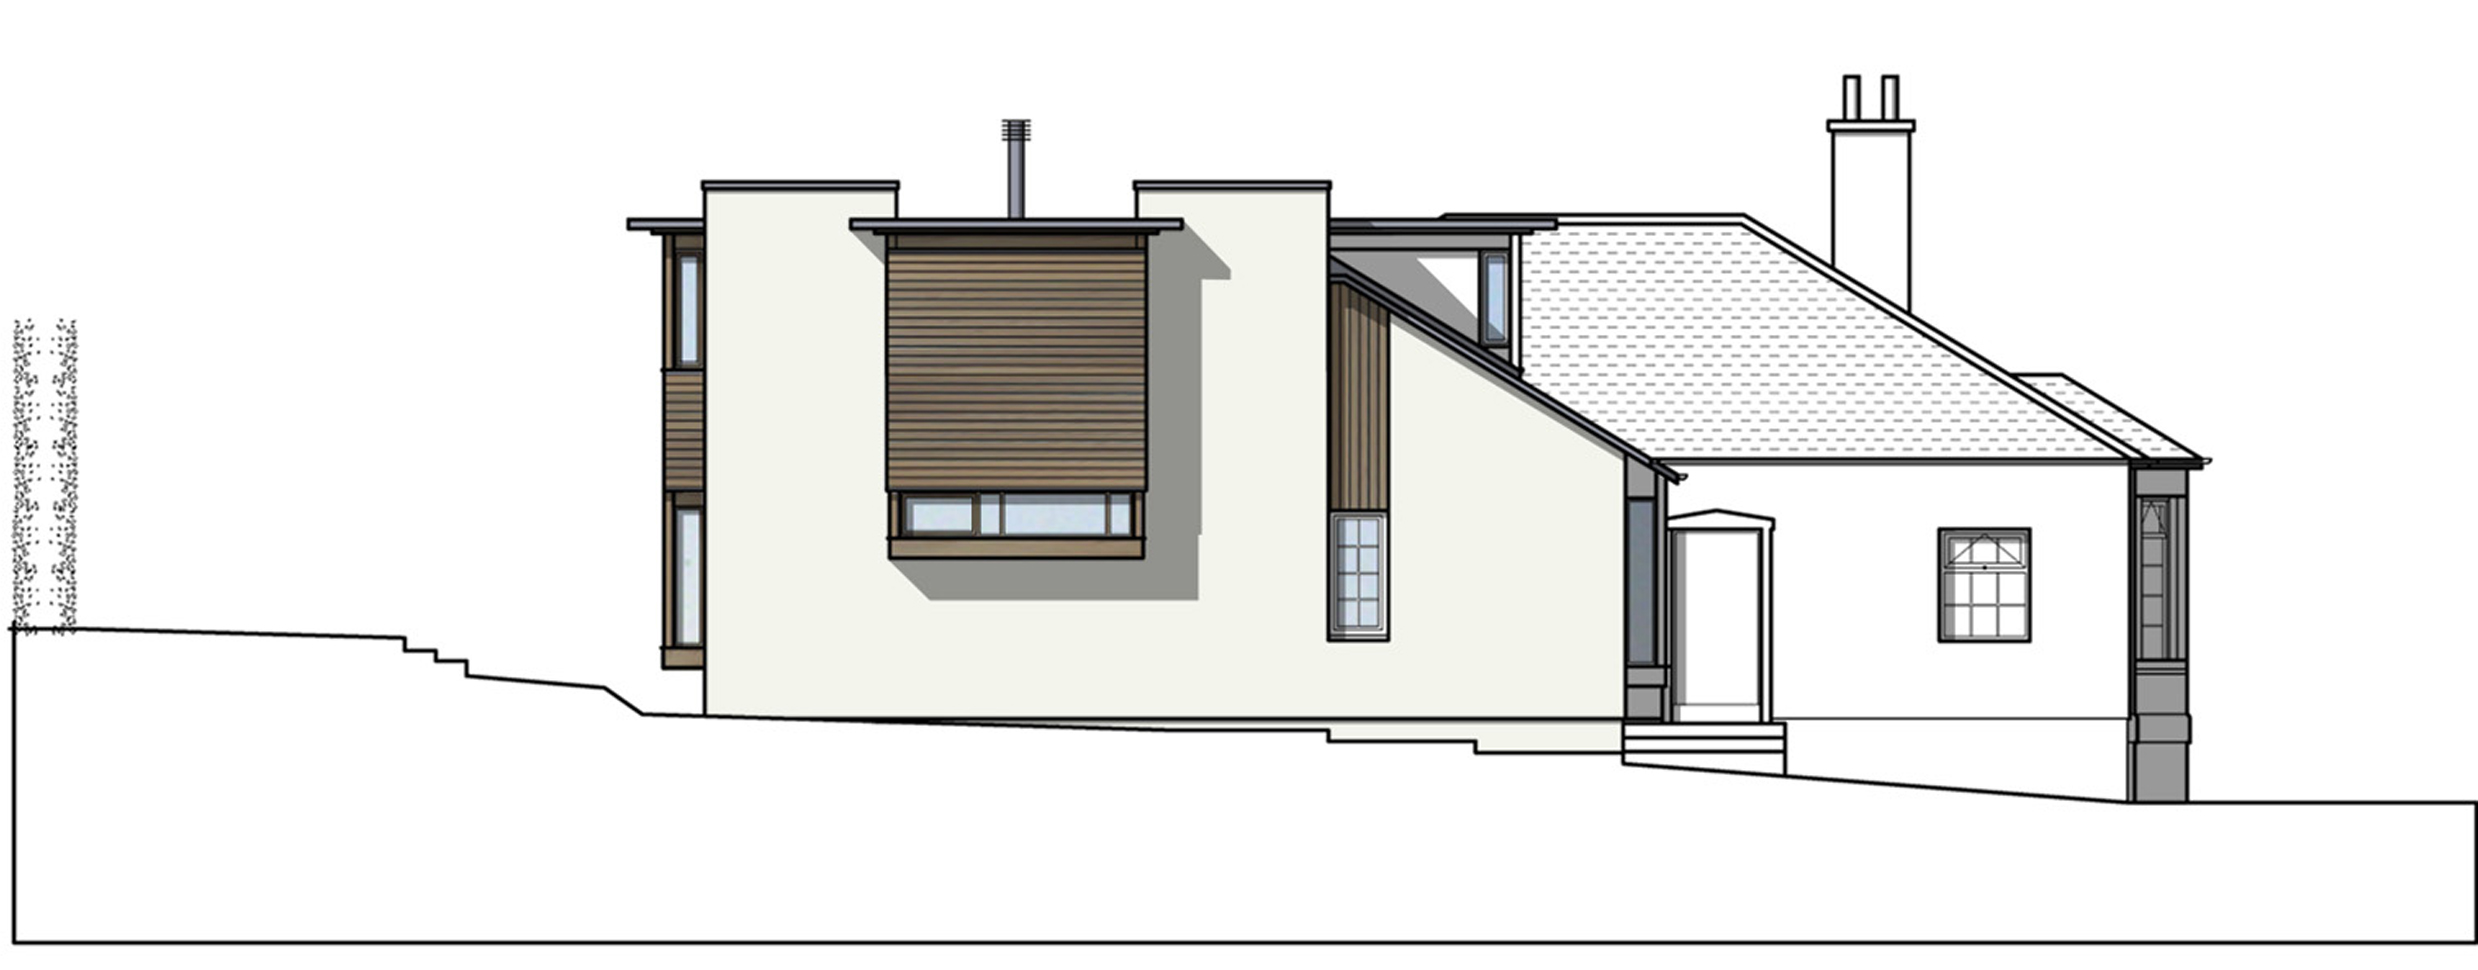 David Blaikie Architects_March Road Elevation